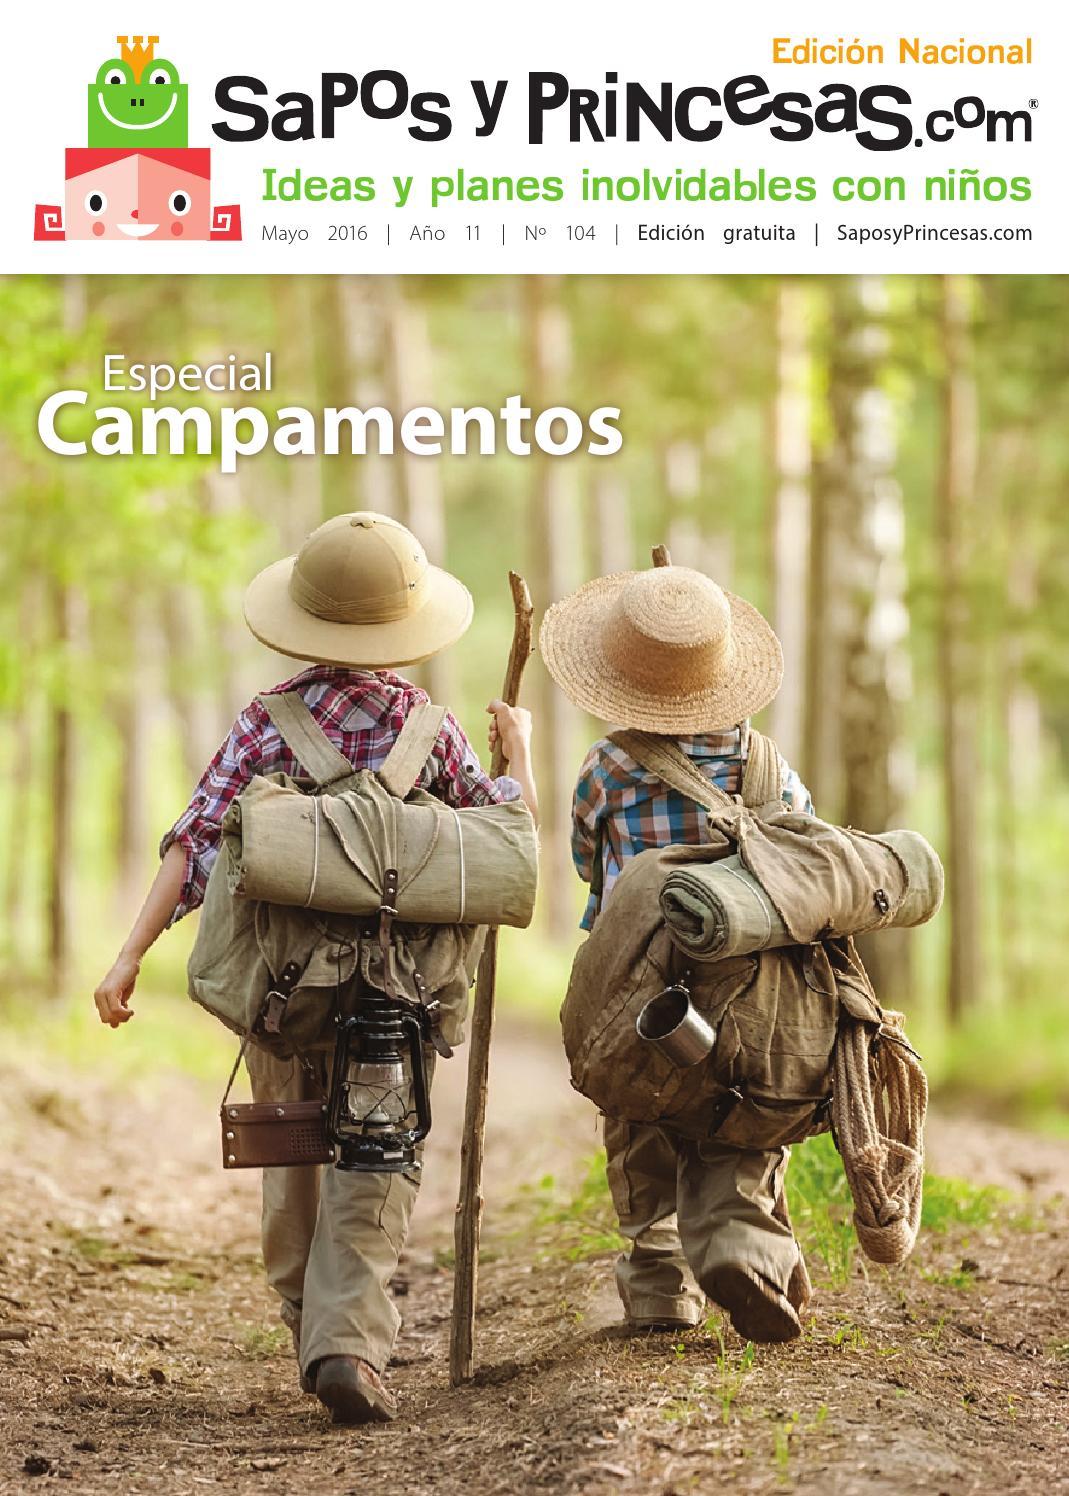 104 Sapos y Princesas Mayo 2016 by SAPOS Y PRINCESAS - issuu